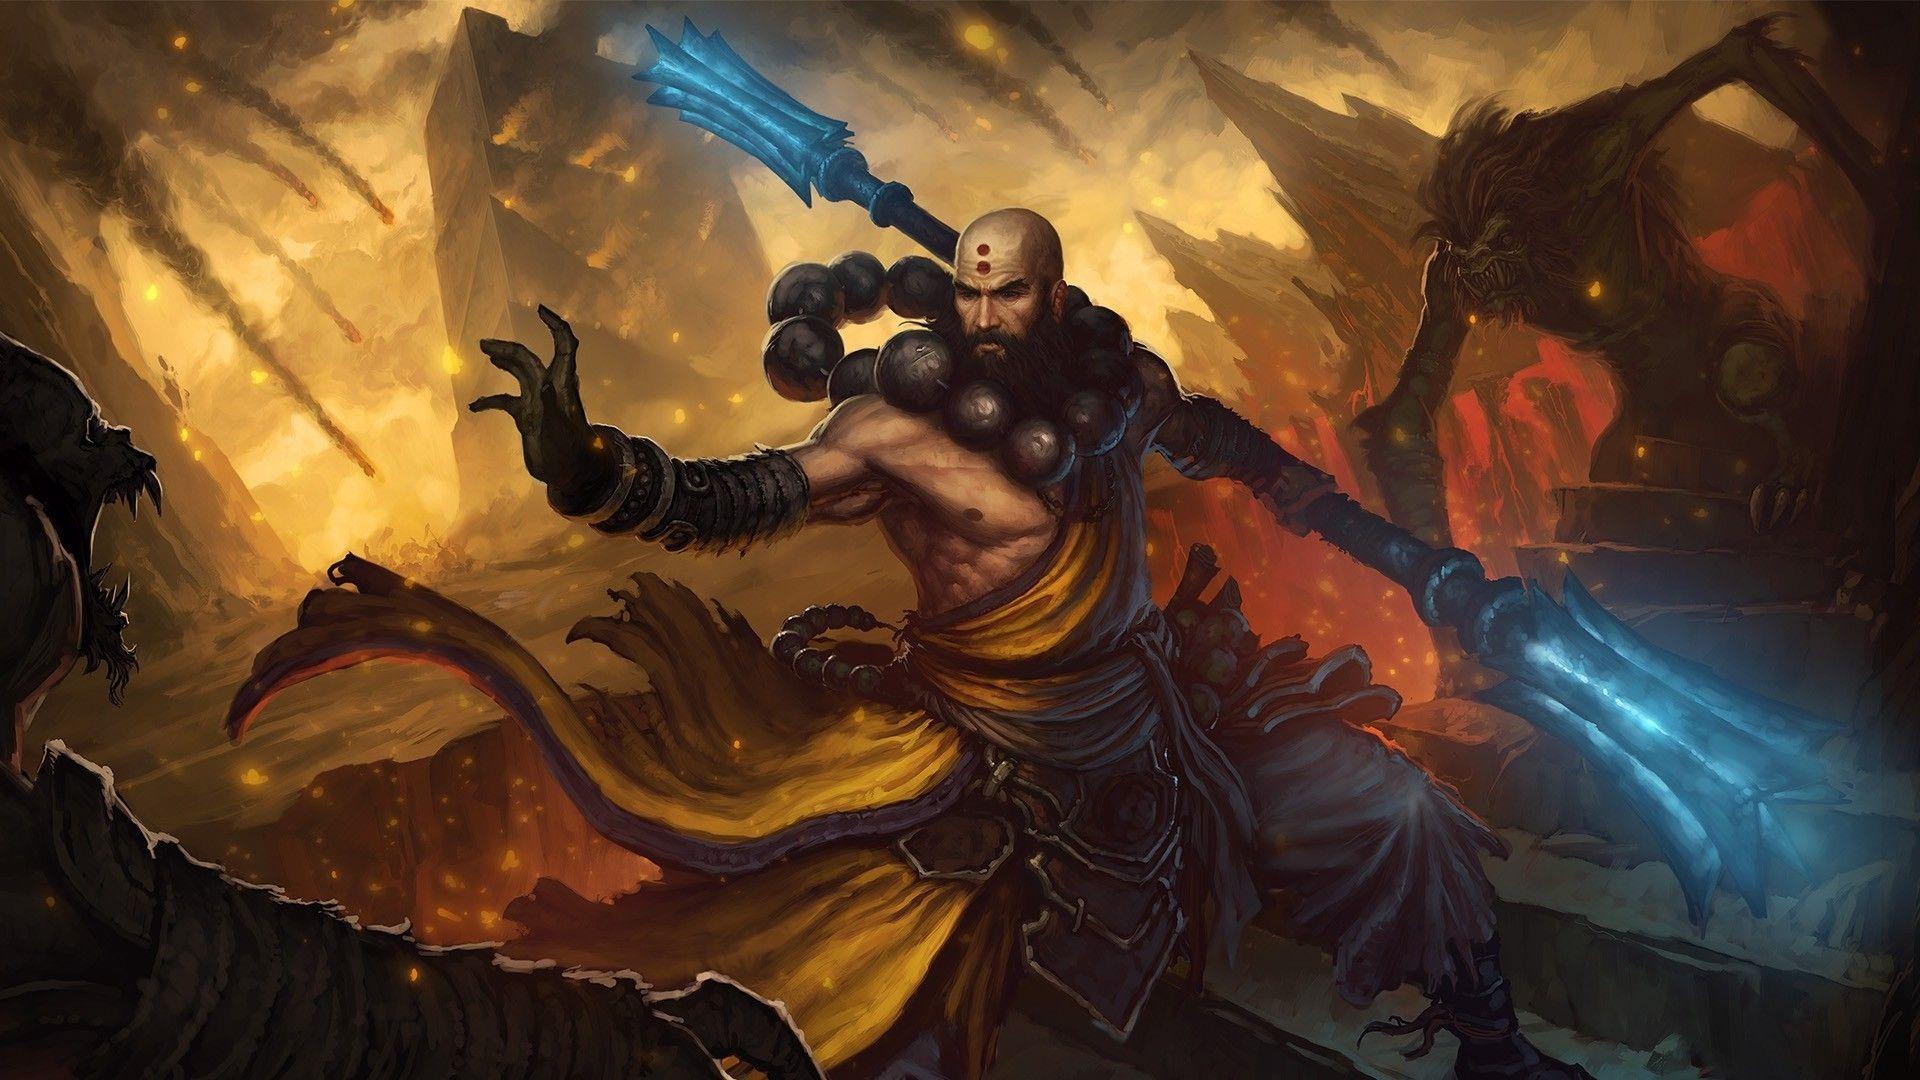 Download Diablo 3 Monk Staff Magic Fire Bald Wallpaper Kuff Games Diablo Artwork Game Art